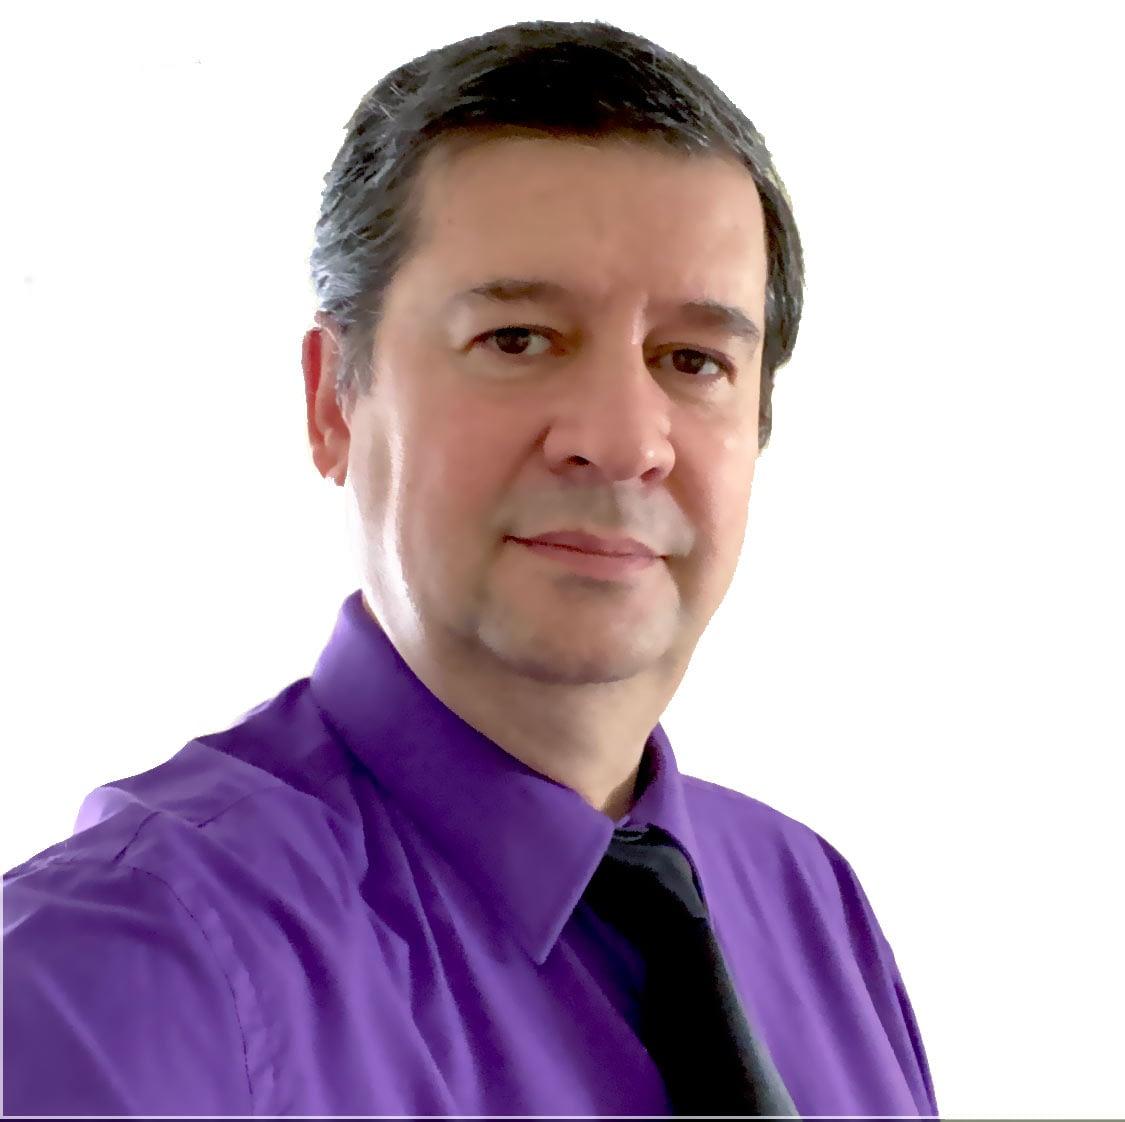 Mike Boldis Digital Marketing Strategist